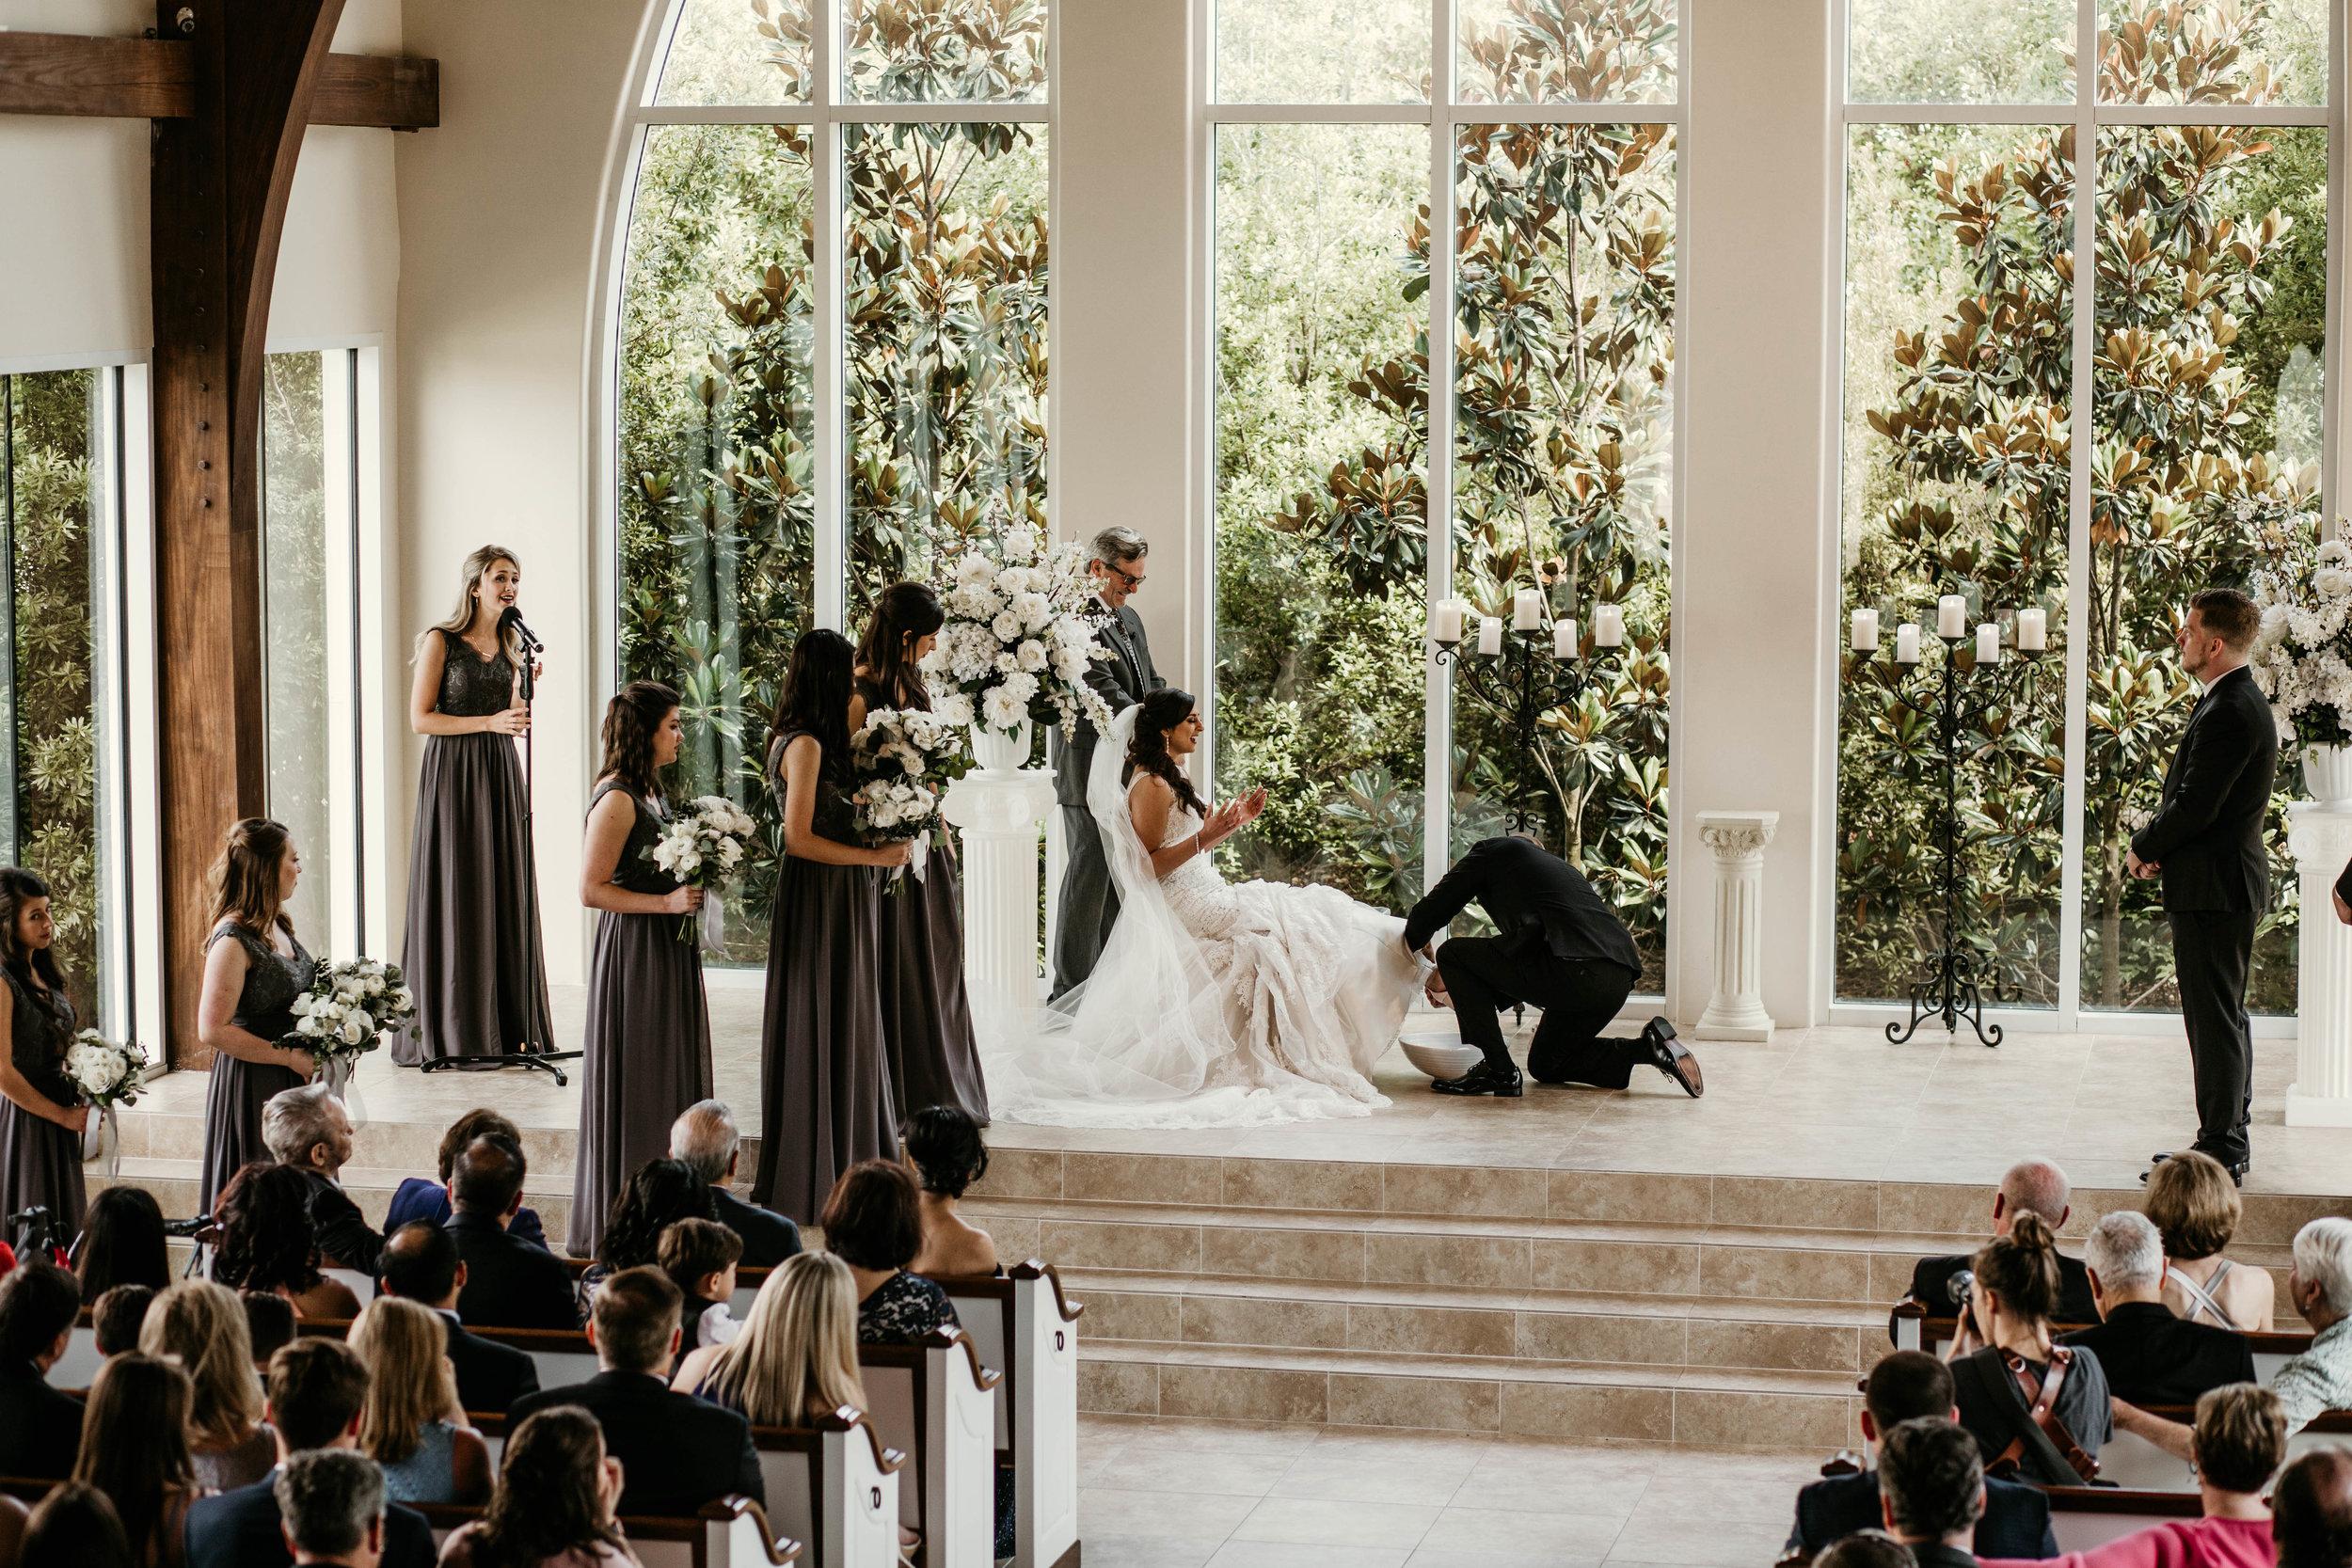 sarah_jason_ashton_gardens_west_houston_wedding-35.jpg